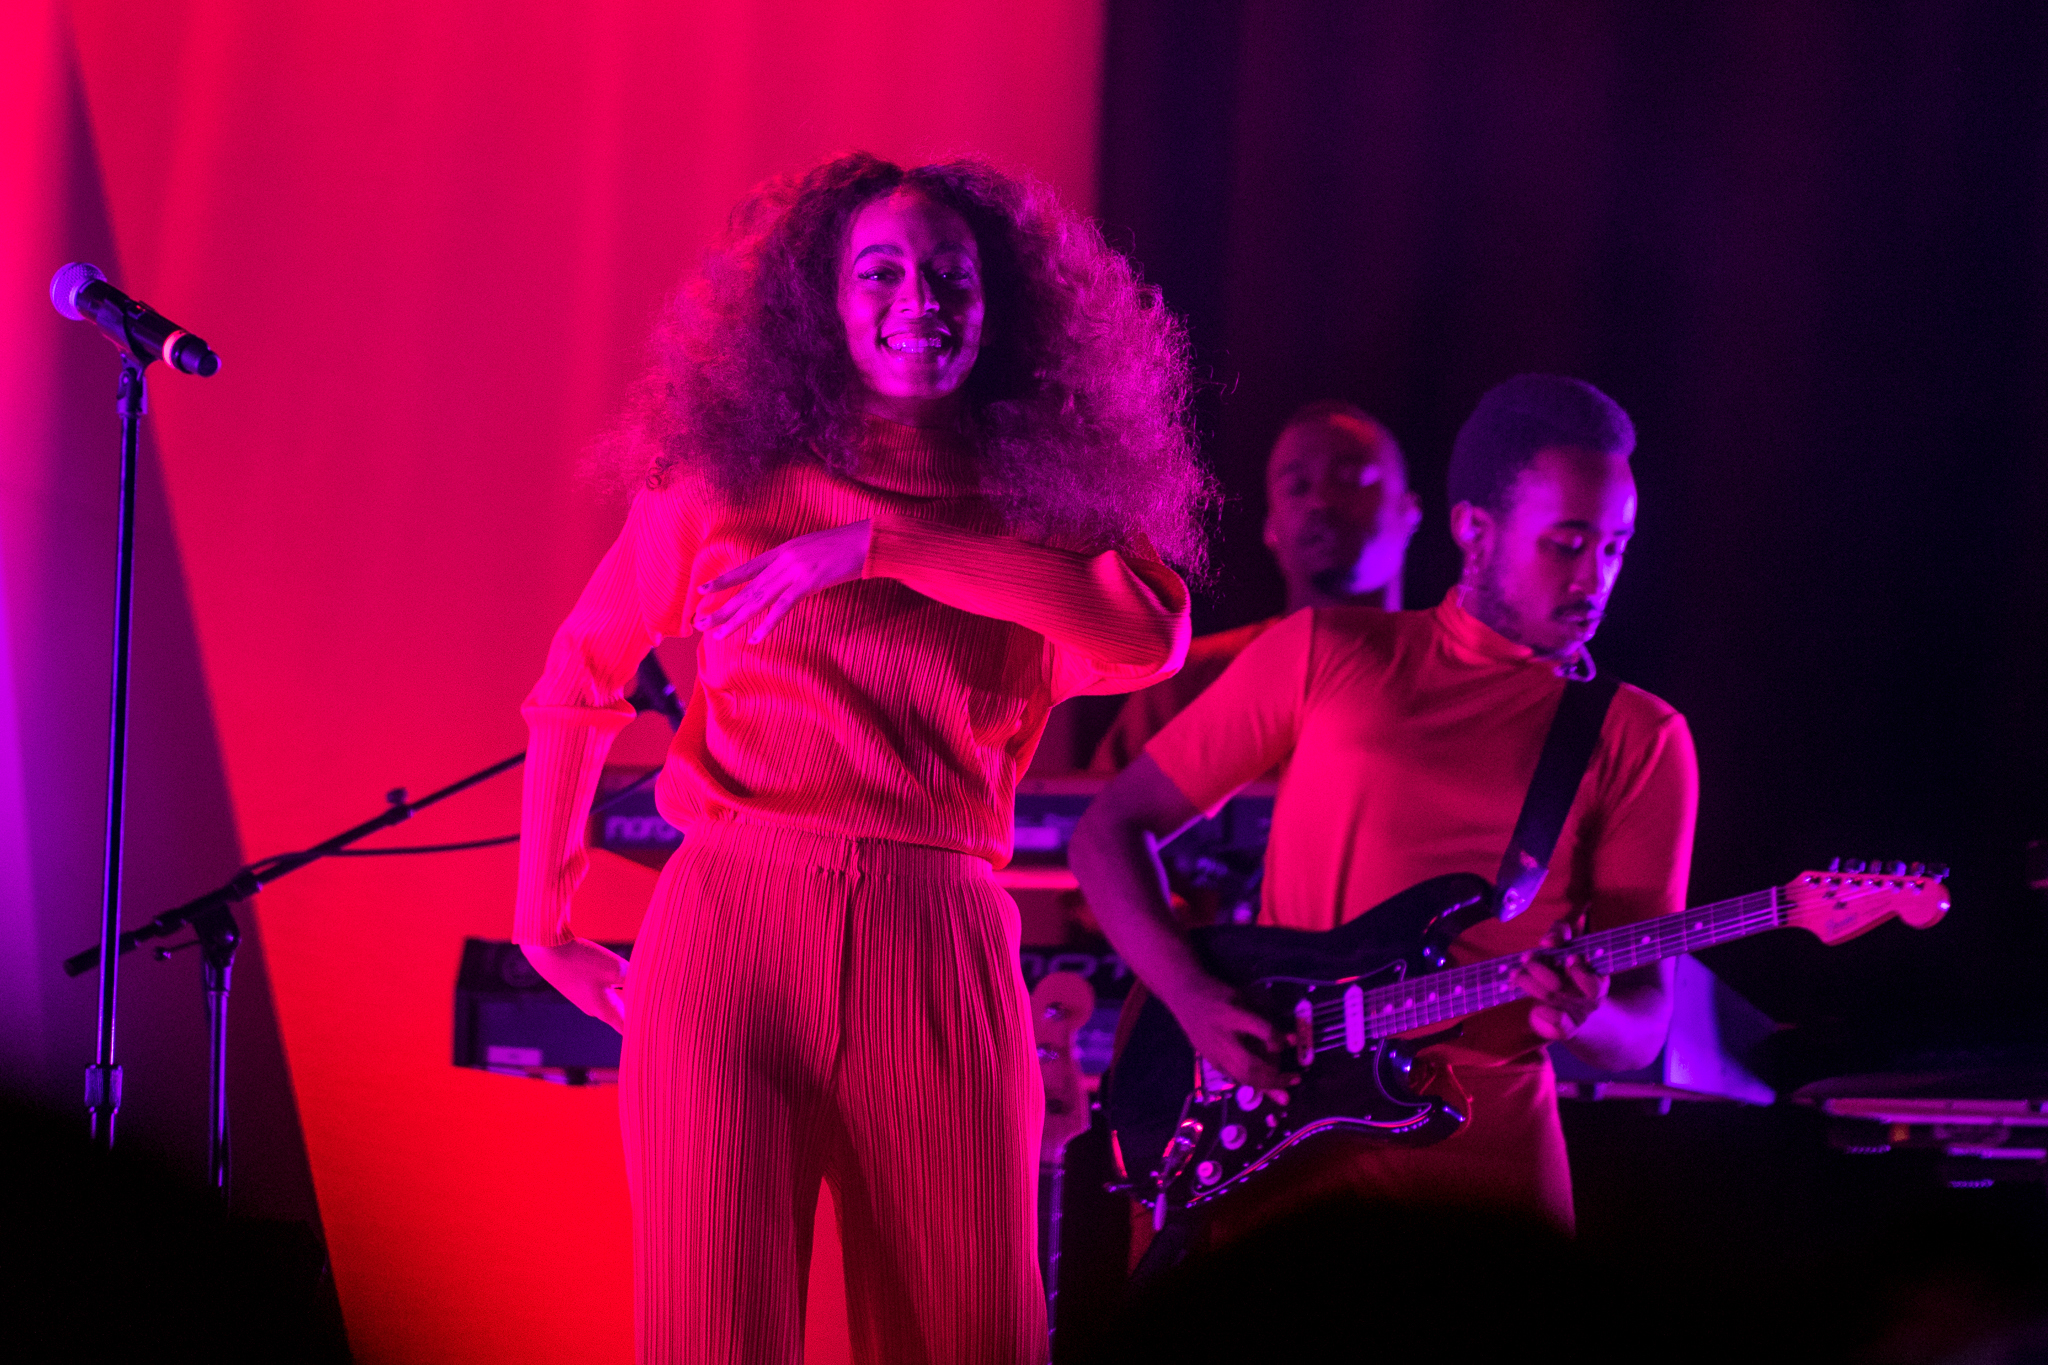 Pitchfork Music Festival 2017, Neal O'Bryan, Solange